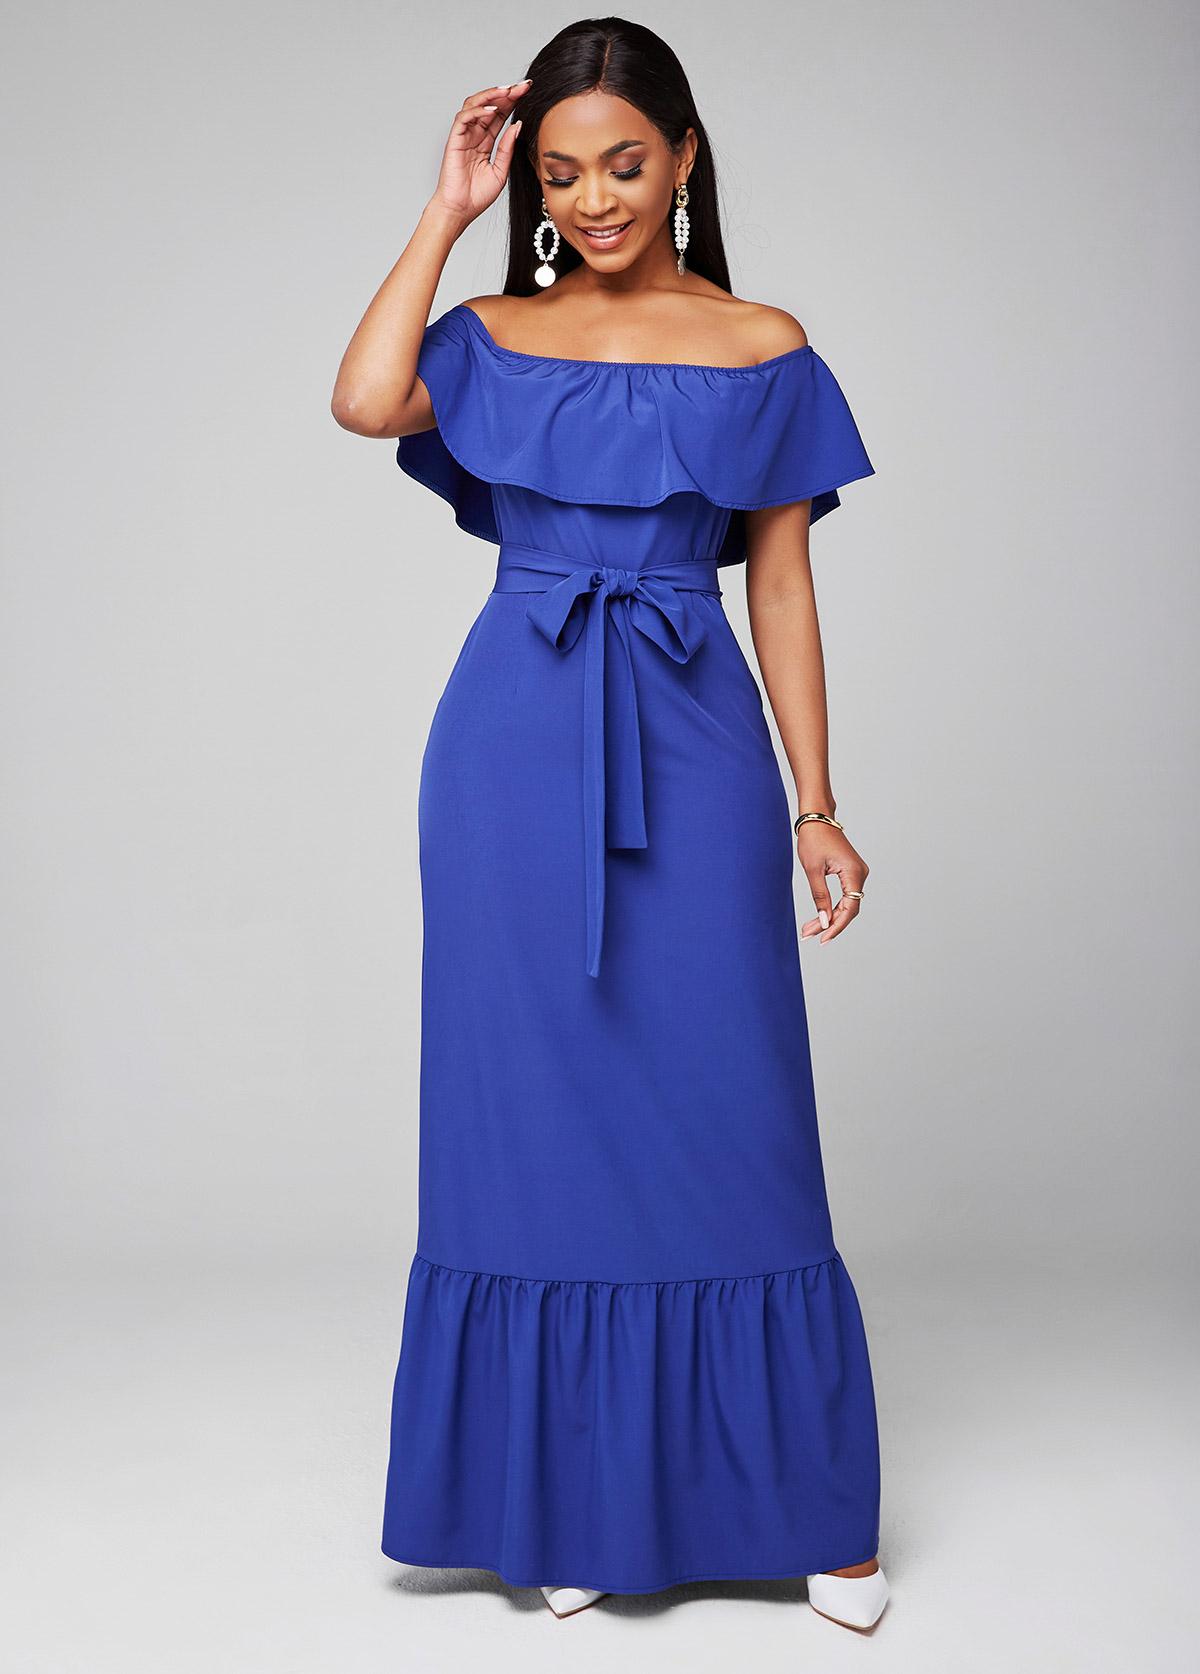 ROTITA Off Shoulder Ruffle Overlay Belted Dress